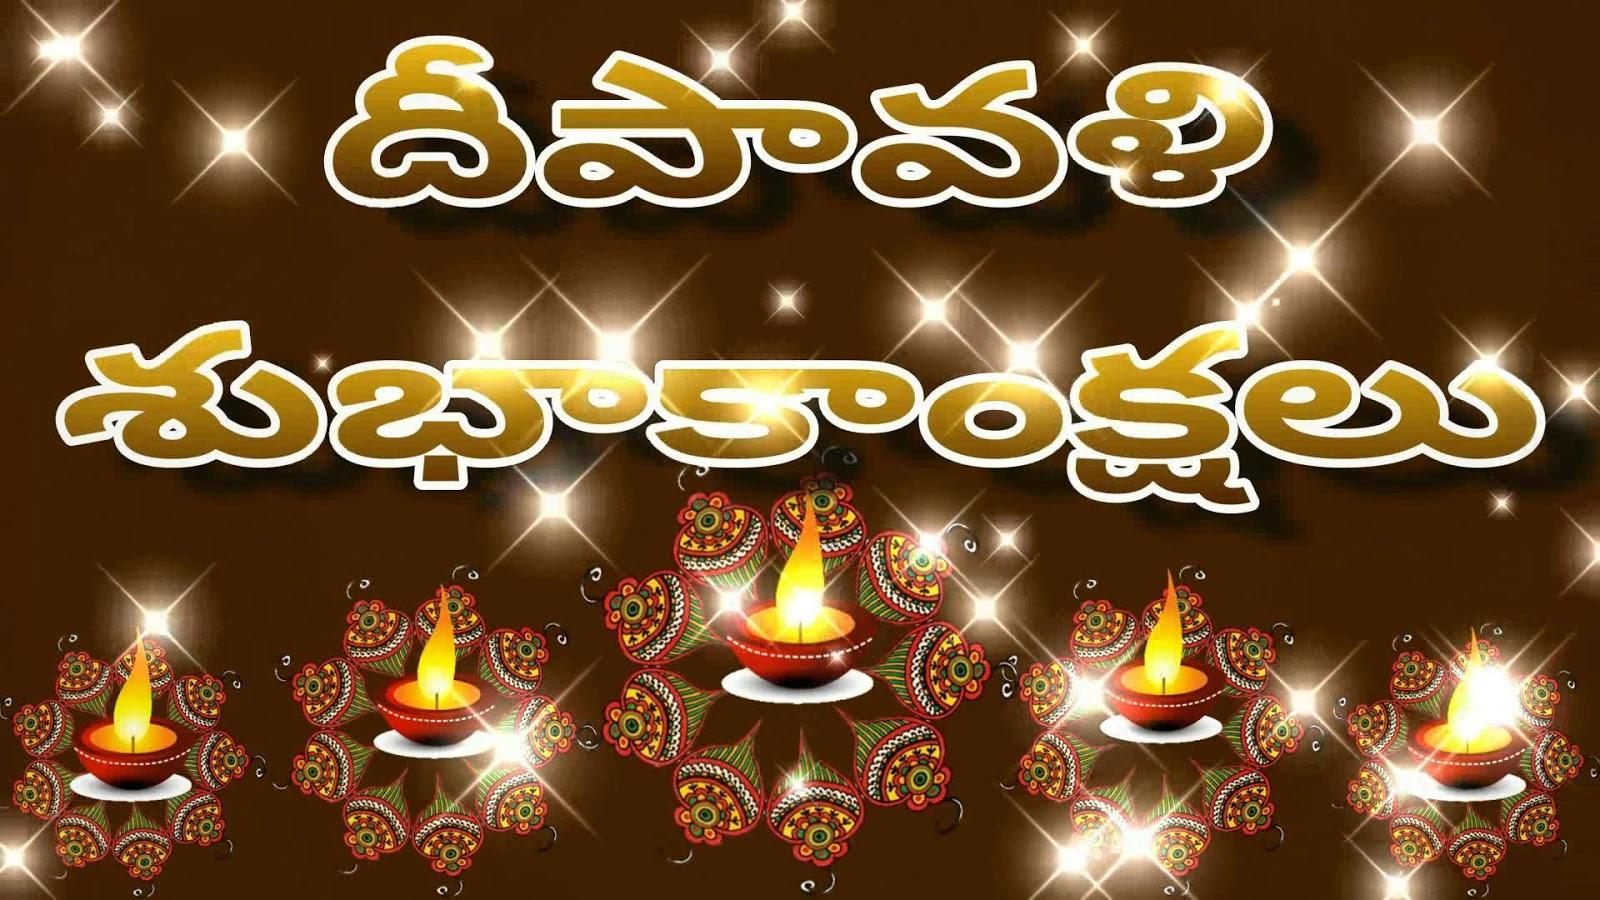 Happy Diwali Telugu Greetings